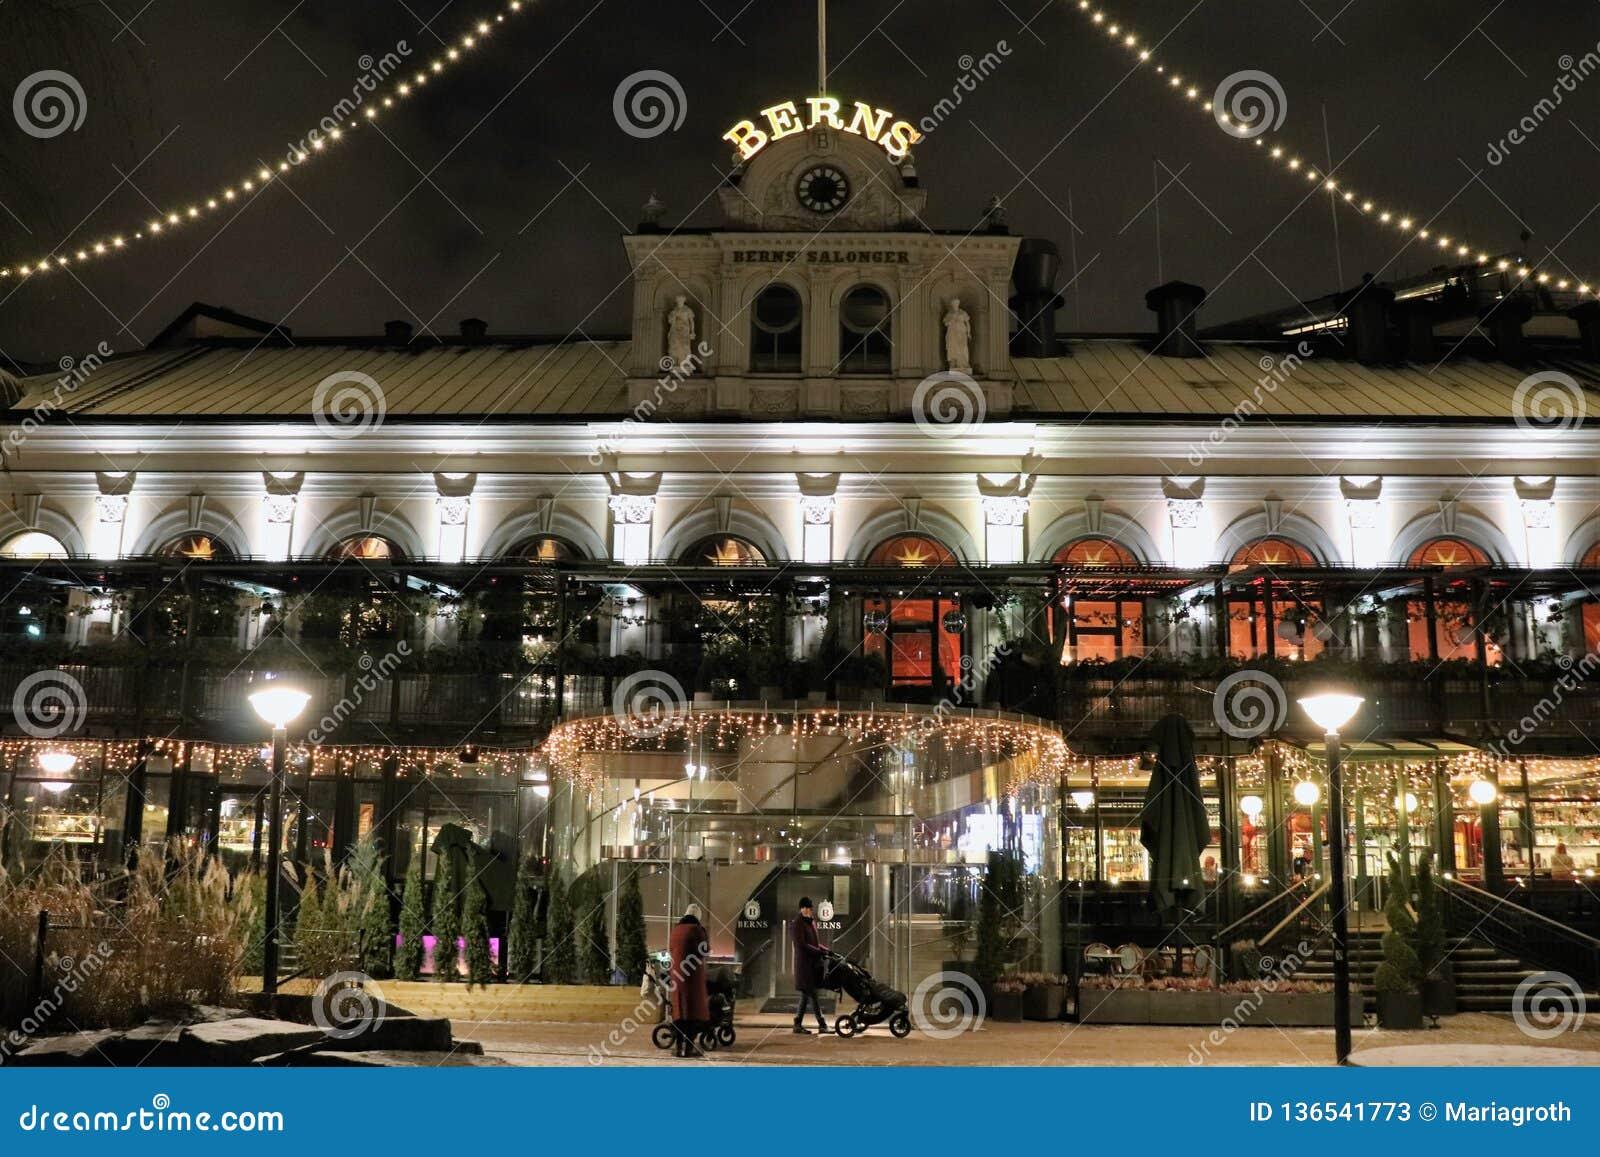 Christmas spirit at Bern`s salons in Stockholm